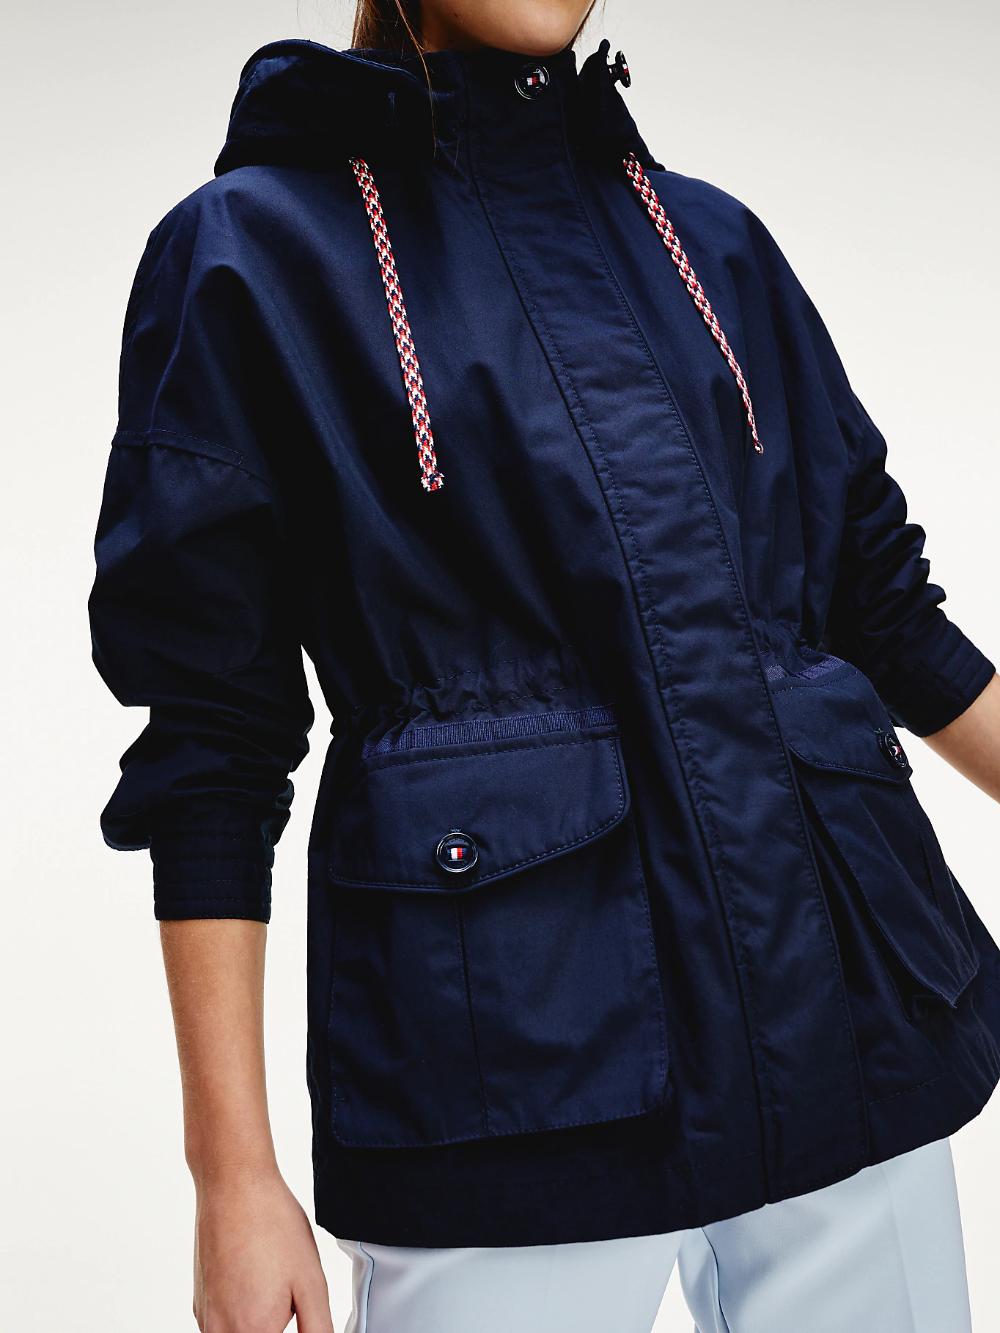 Hooded Utility Parka Blue Tommy Hilfiger Outerwear Jackets Women S Coats Jackets Jackets [ 1333 x 1000 Pixel ]